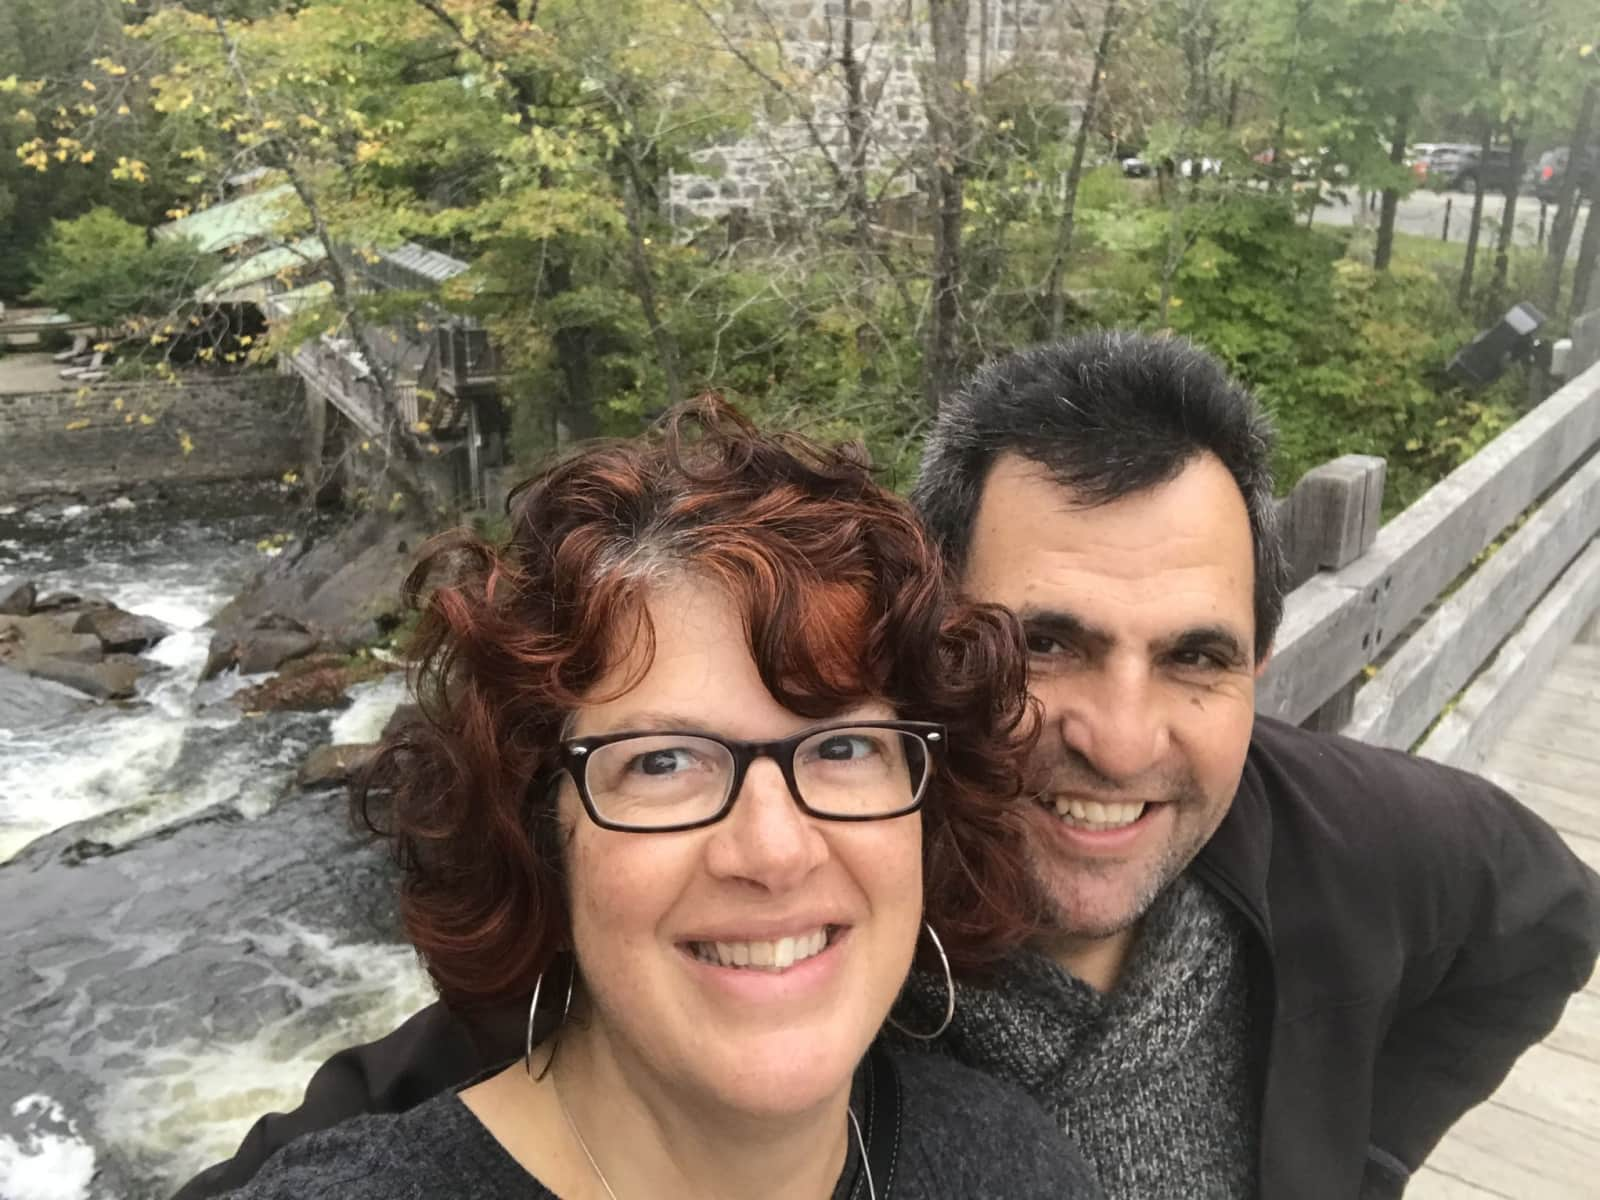 Linda from Ottawa, Ontario, Canada